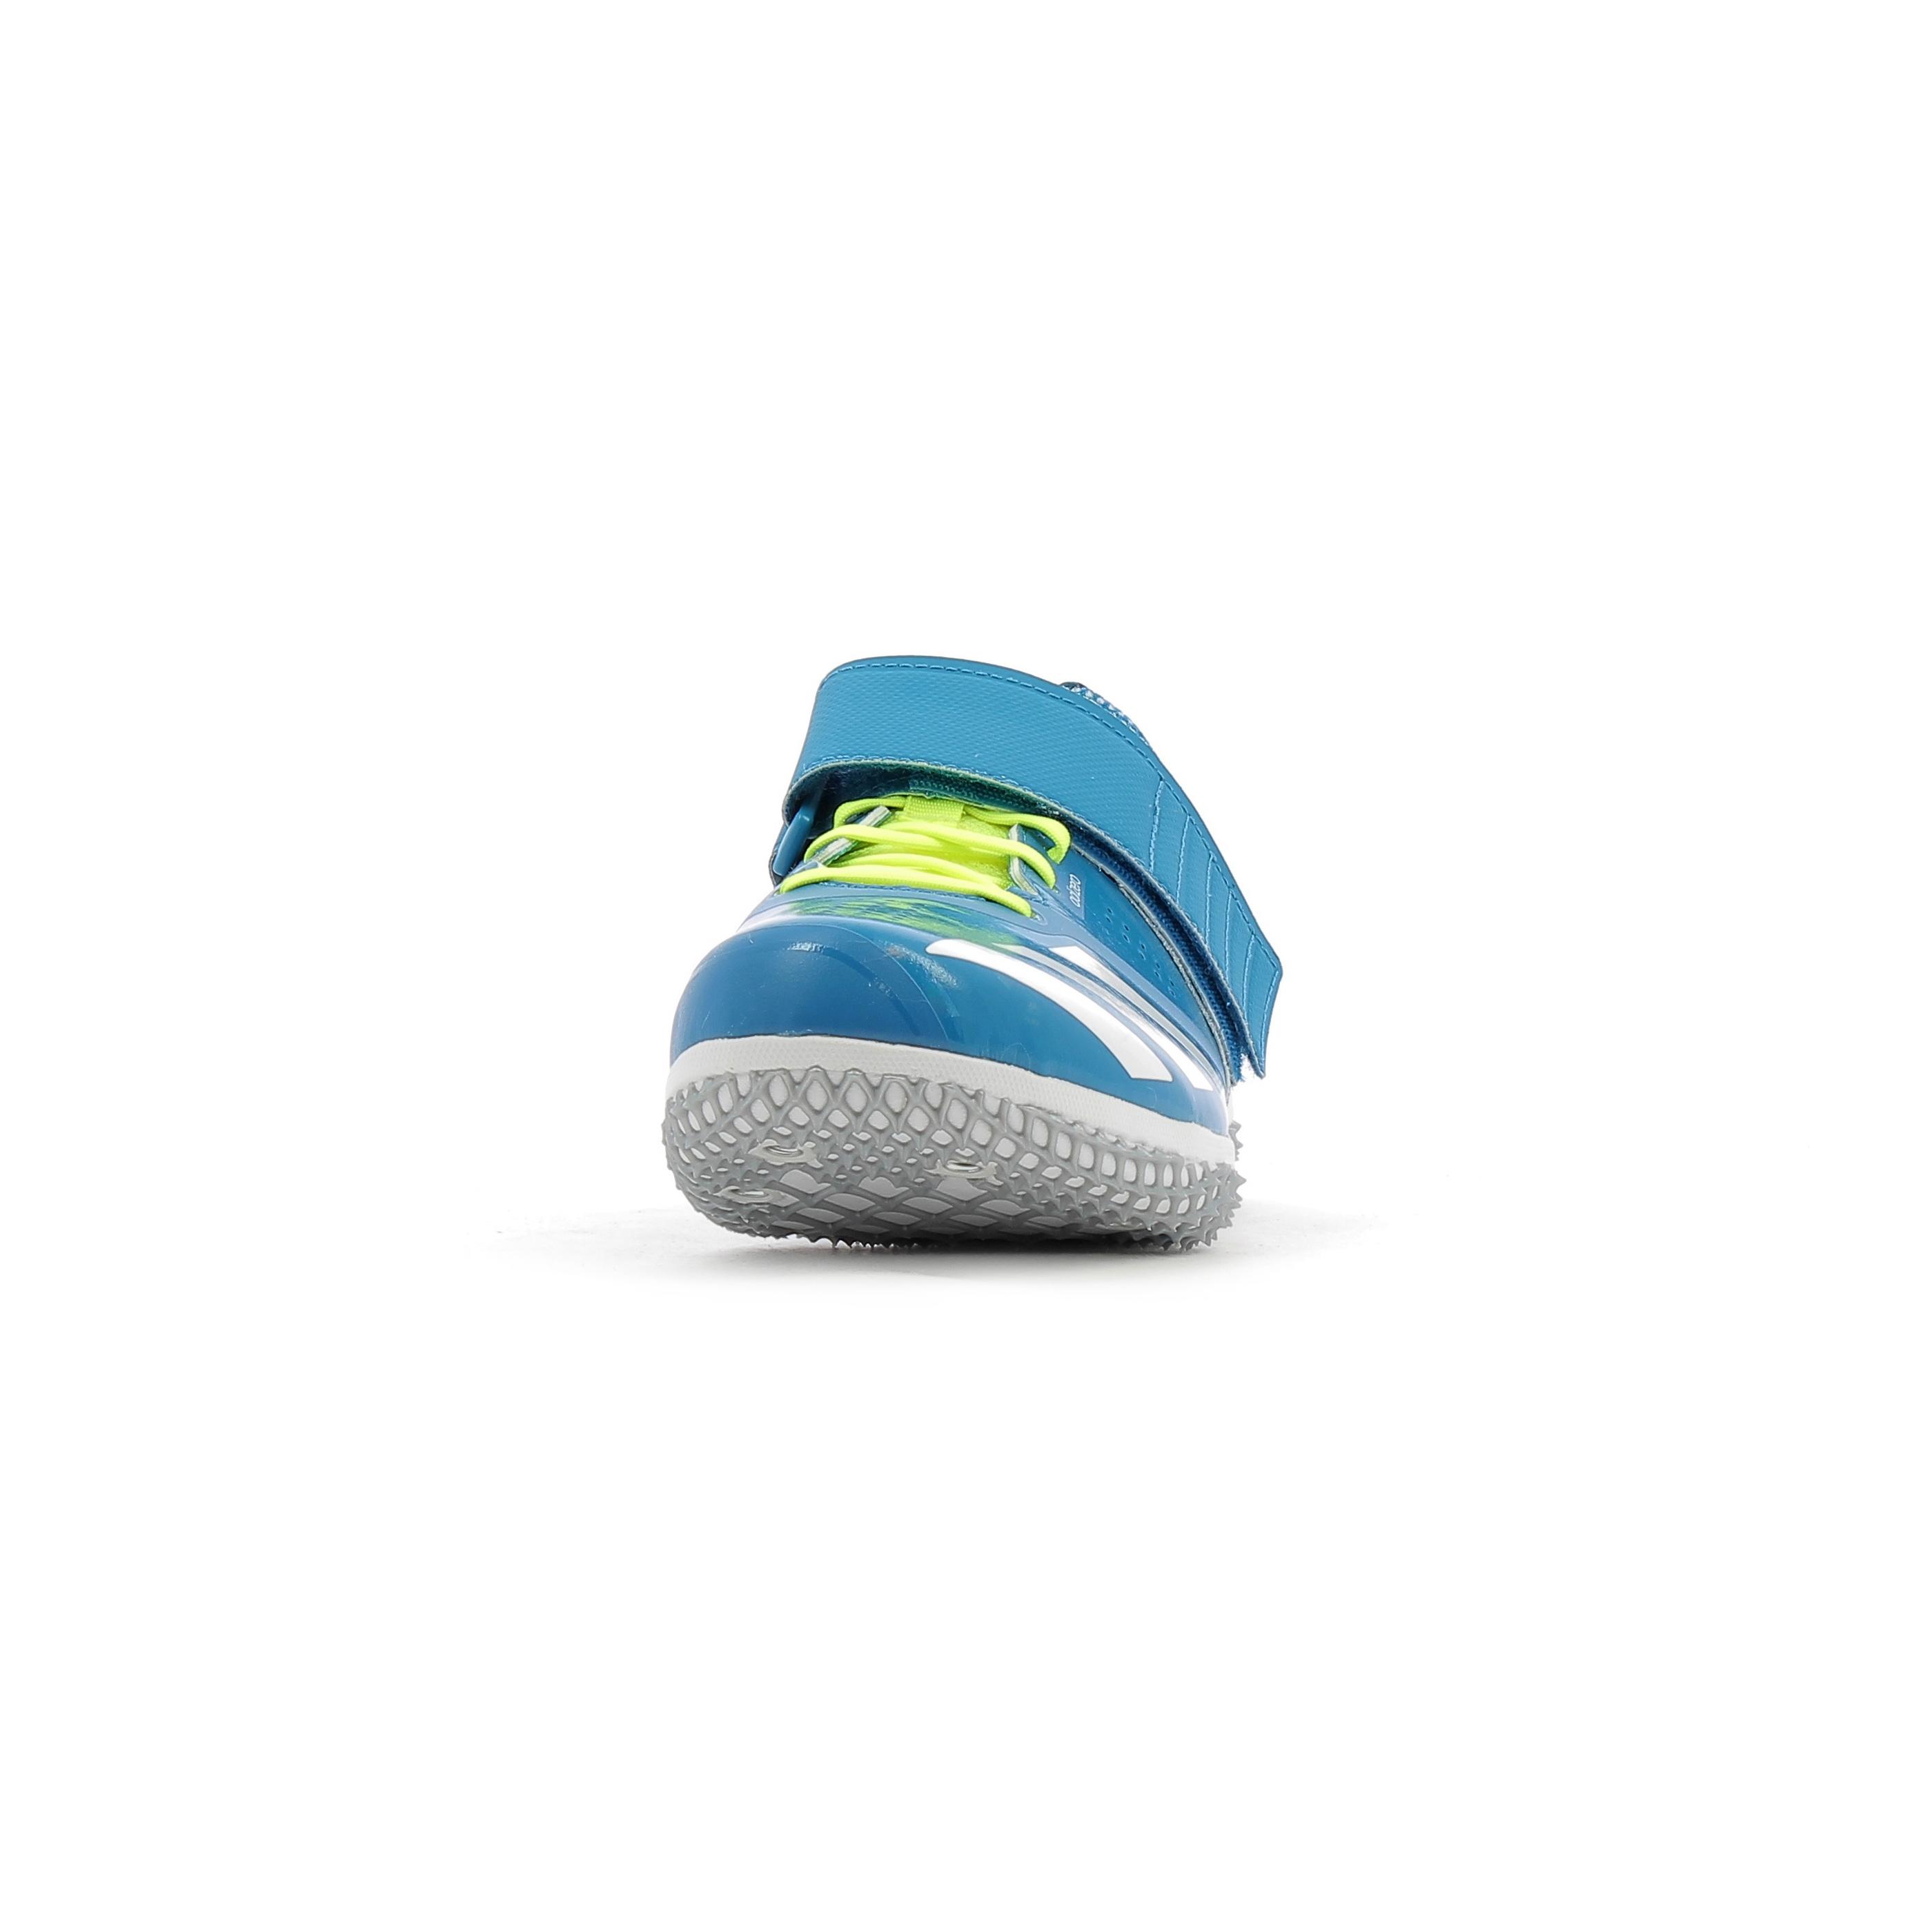 adidas chaussure d'athlétisme adizero hj